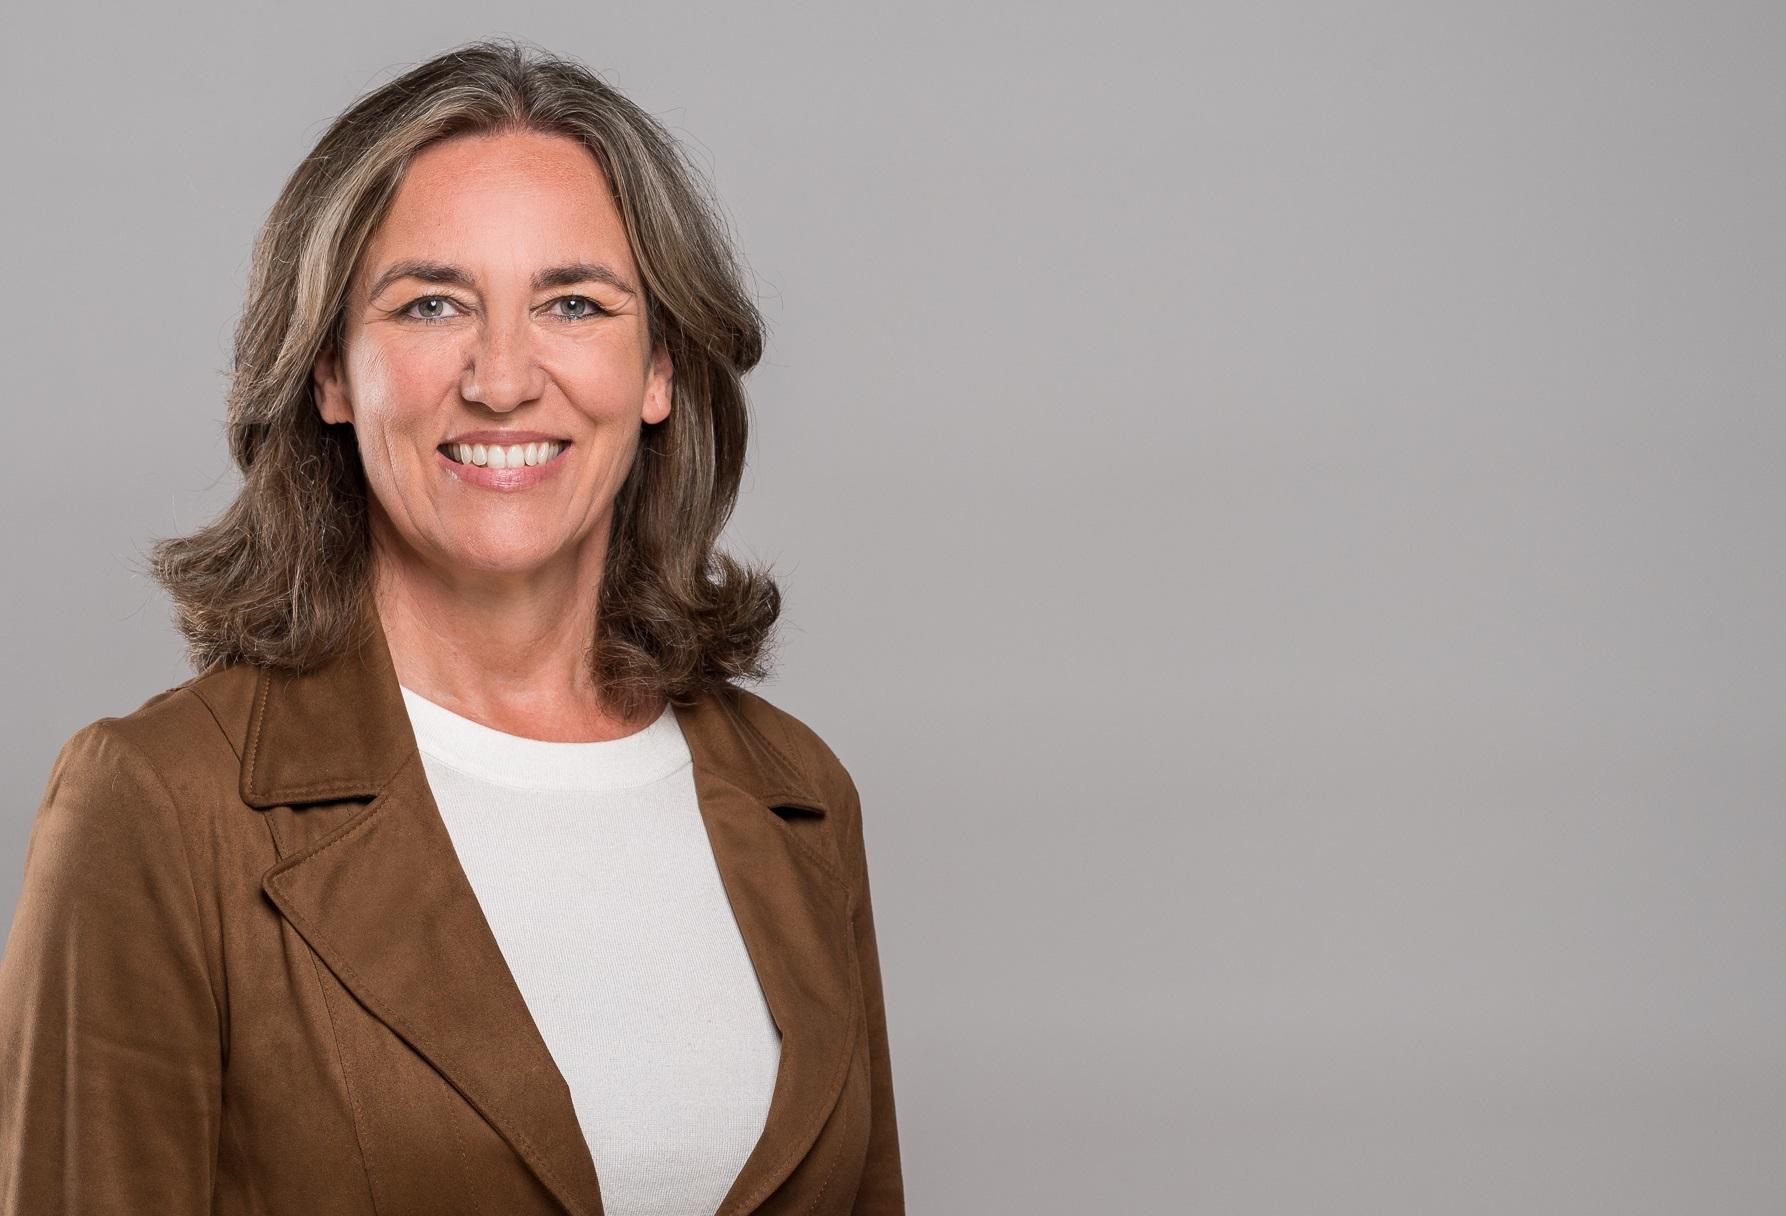 Irene-Bongenaar-Officemanager-Laride-fotografie-Twycer